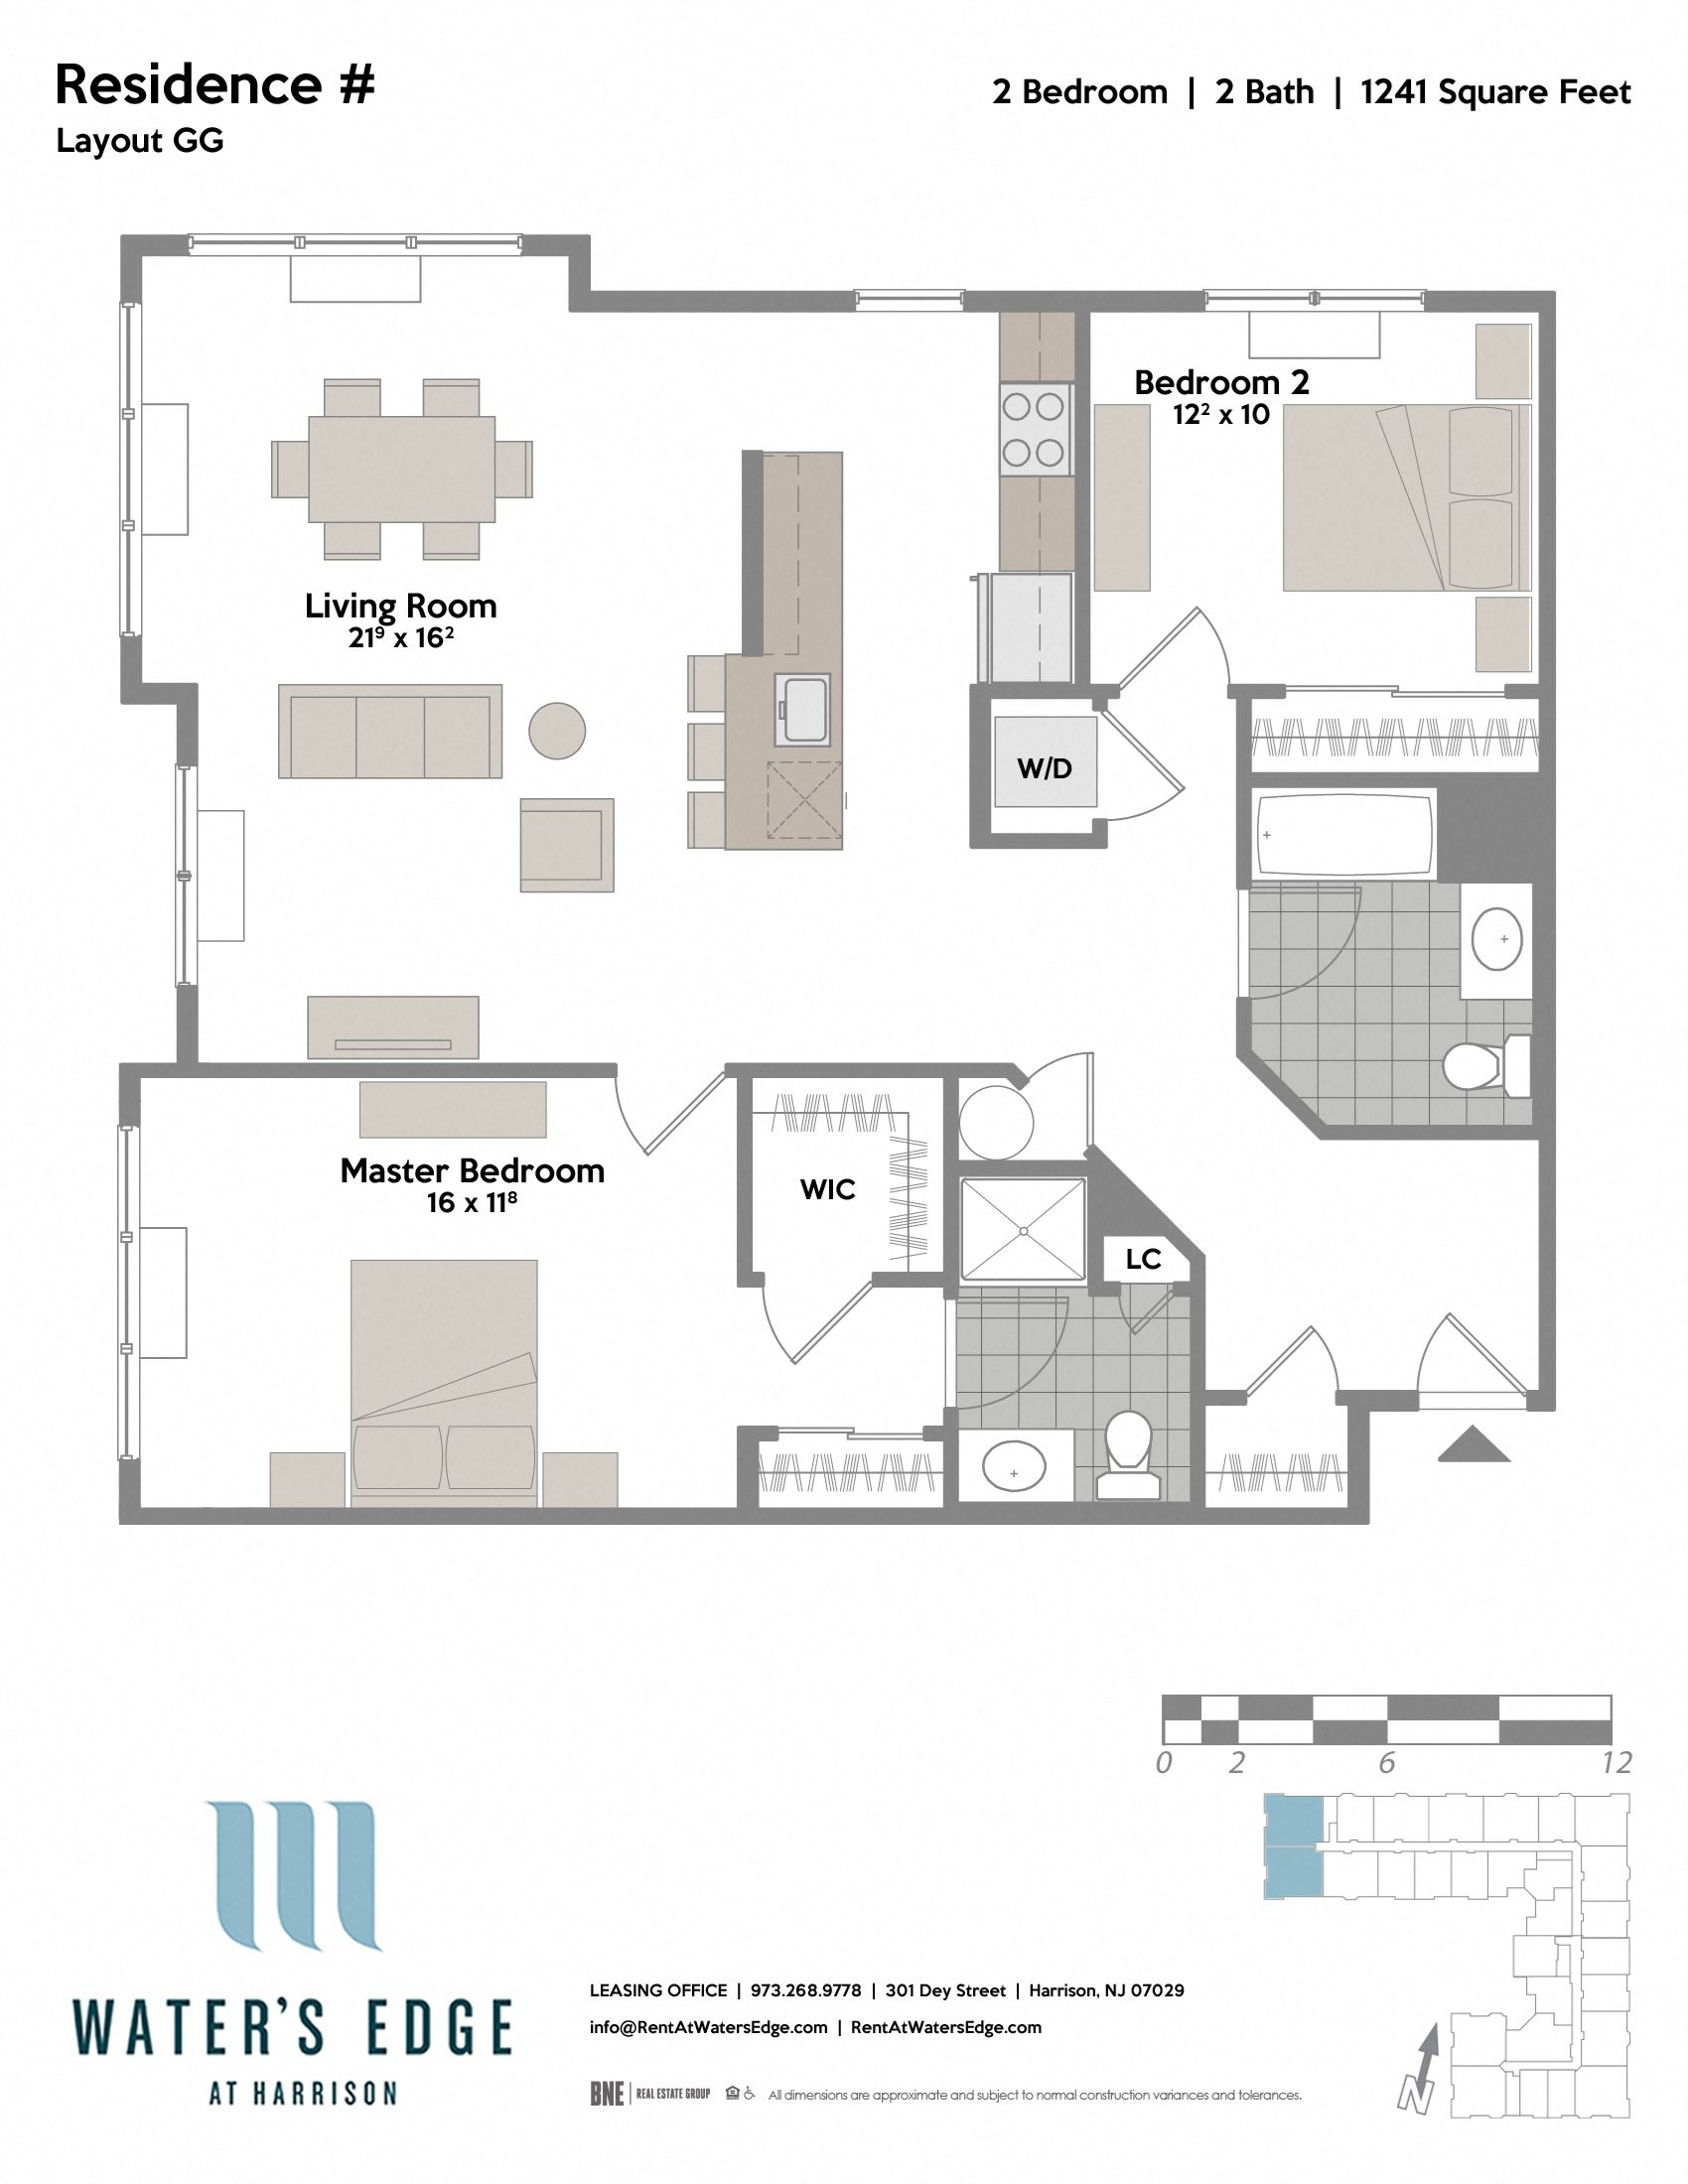 Layout GG Floor Plan 8